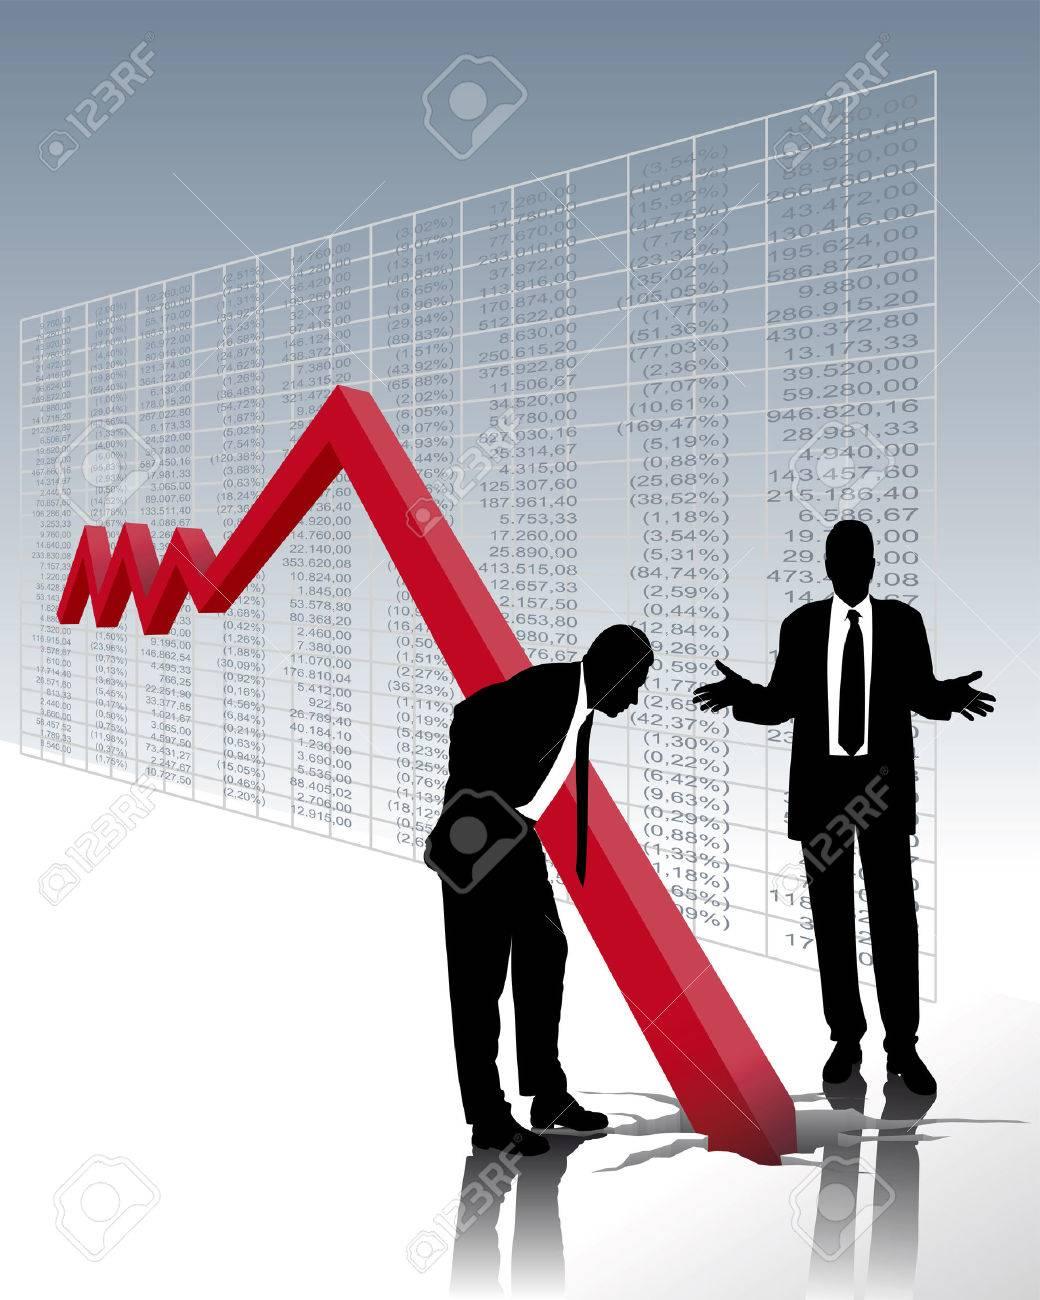 4792540-stock-market-crash-stock-photo.jpg